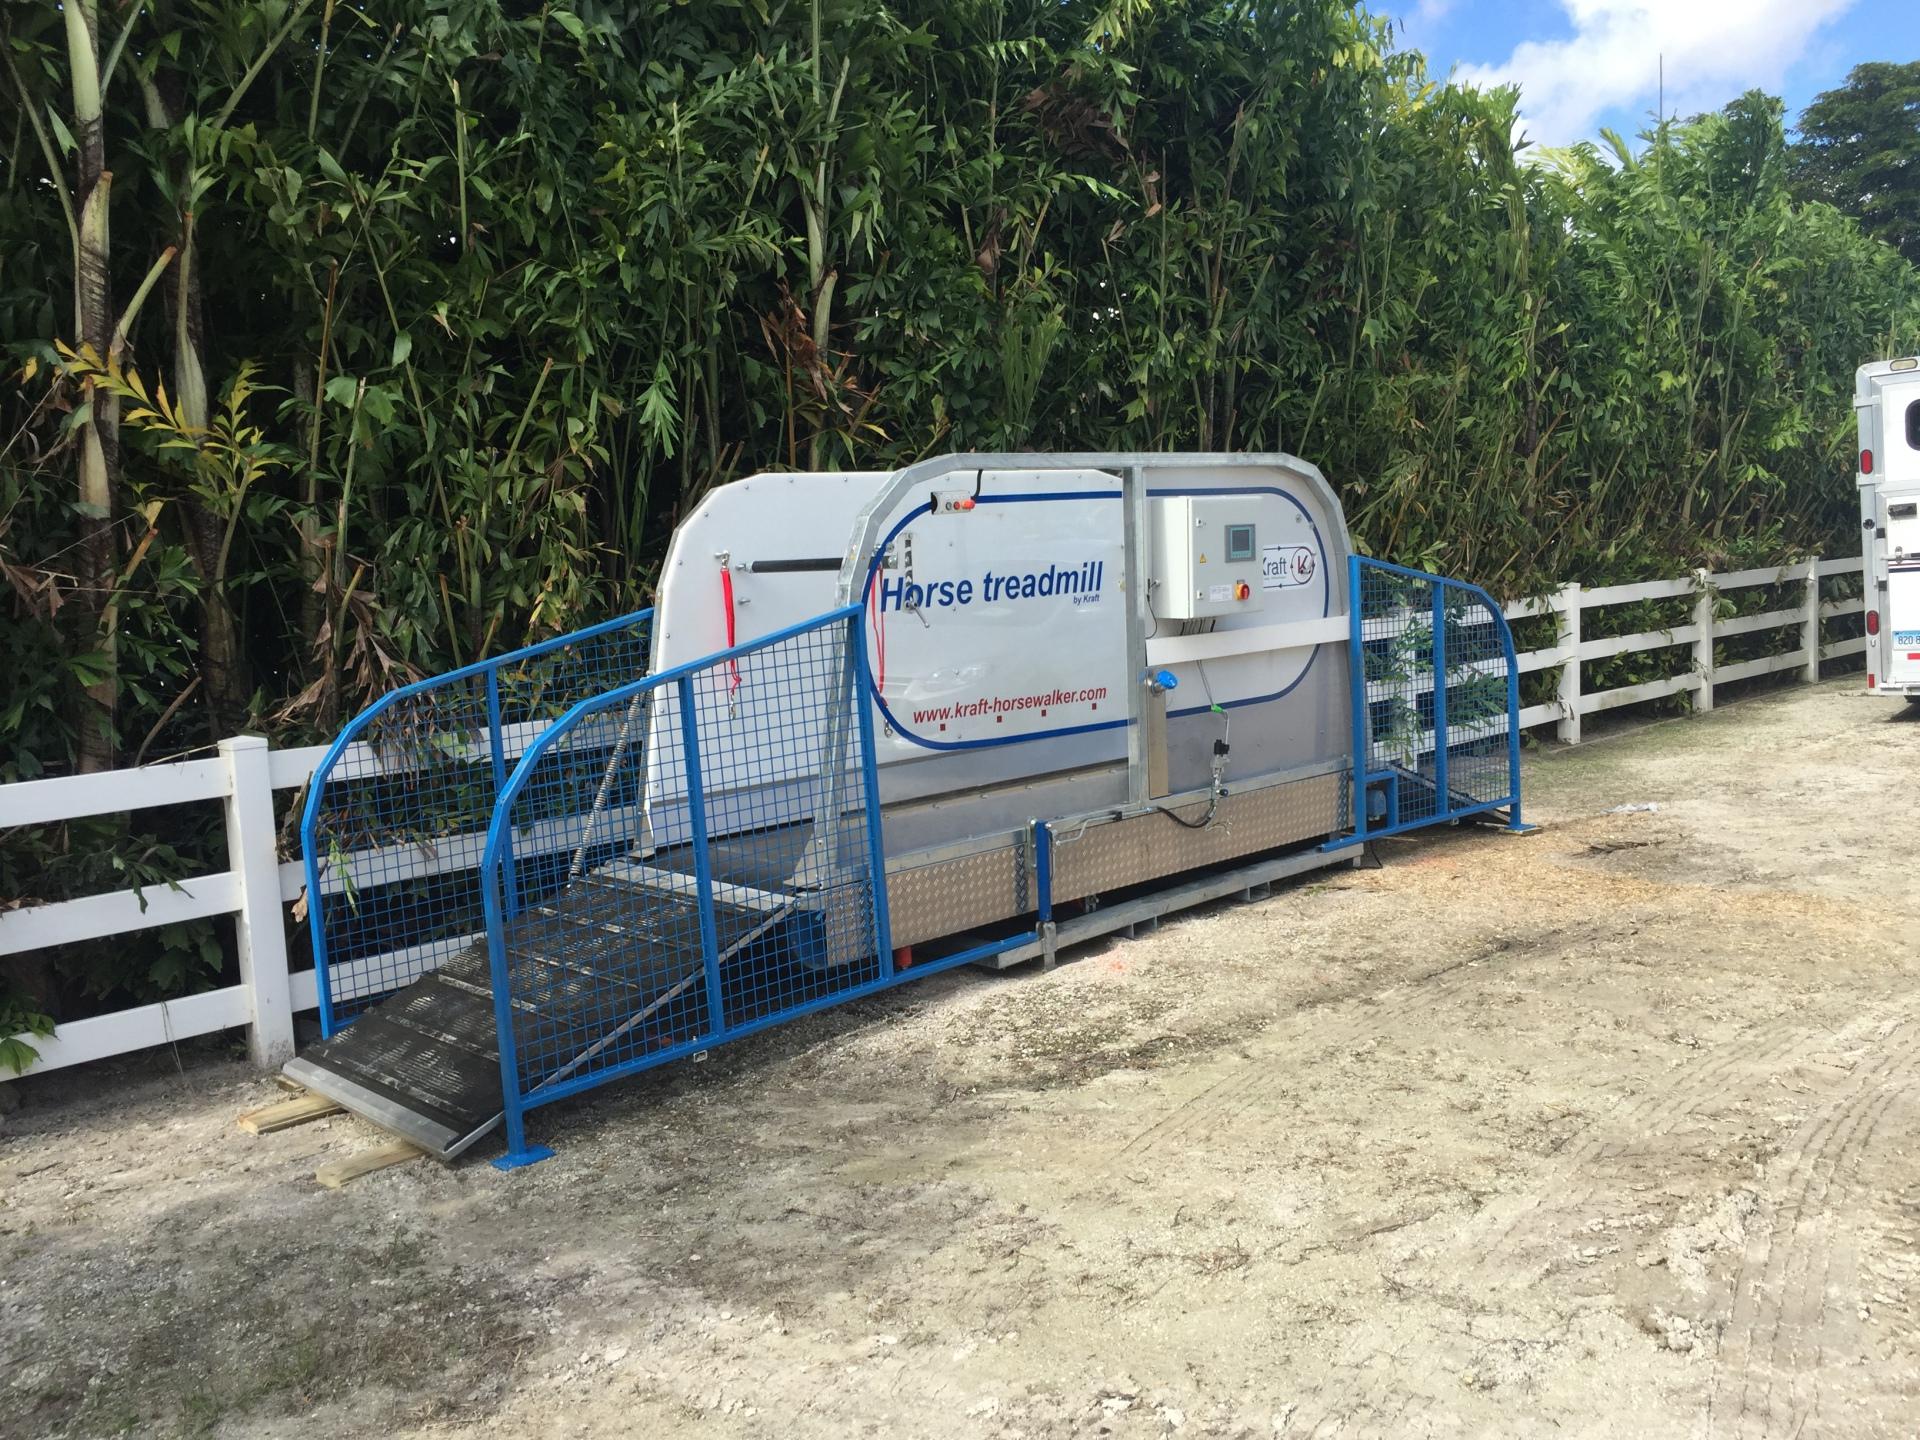 Horse Treadmill in Wellington, FL